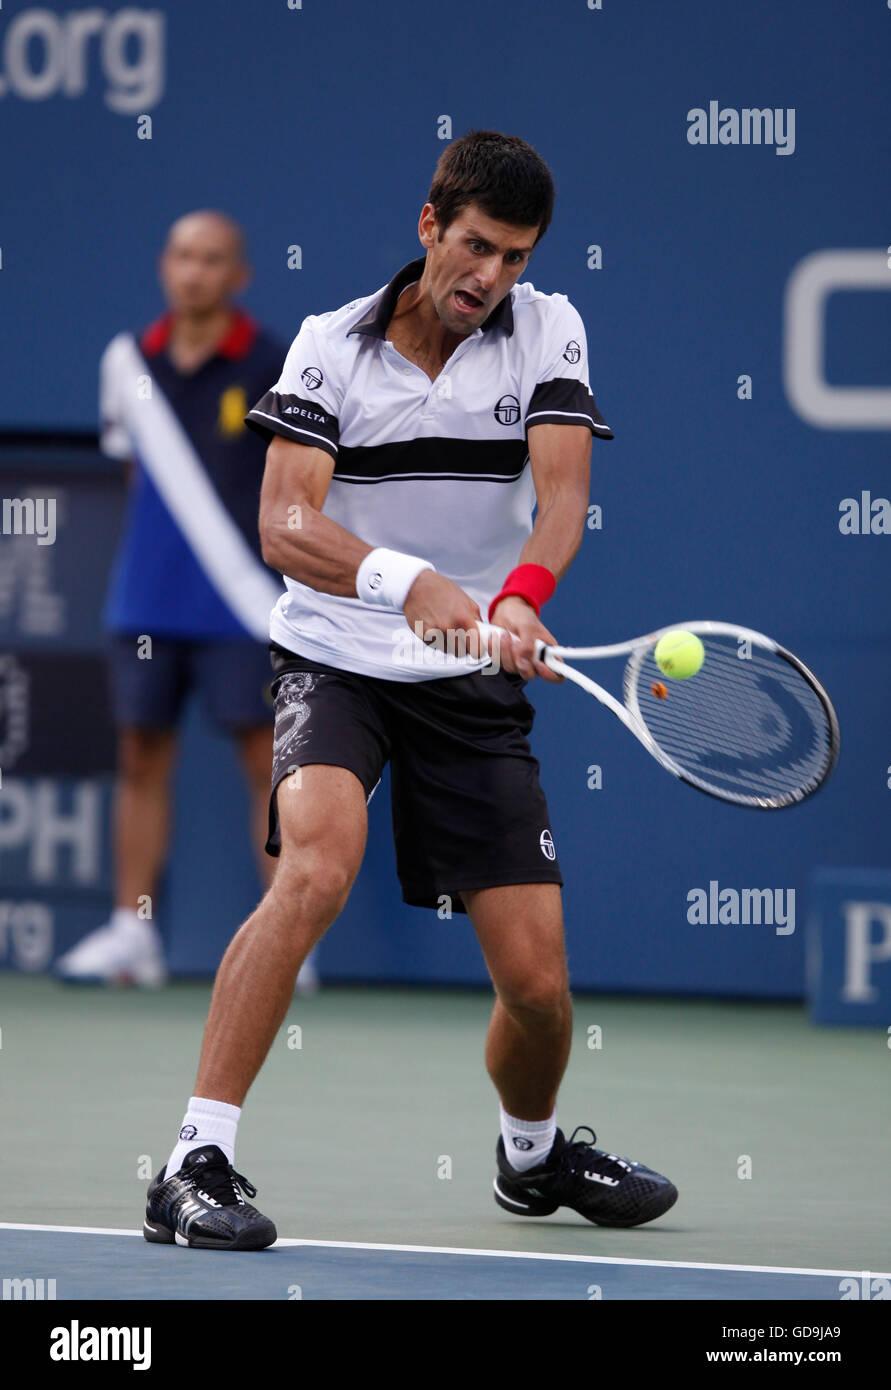 Novak Djokovic, SRB, 2010 U.S. Open, ITF Grand Slam Tennis Tournament, USTA Billie Jean King National Tennis Center - Stock Image